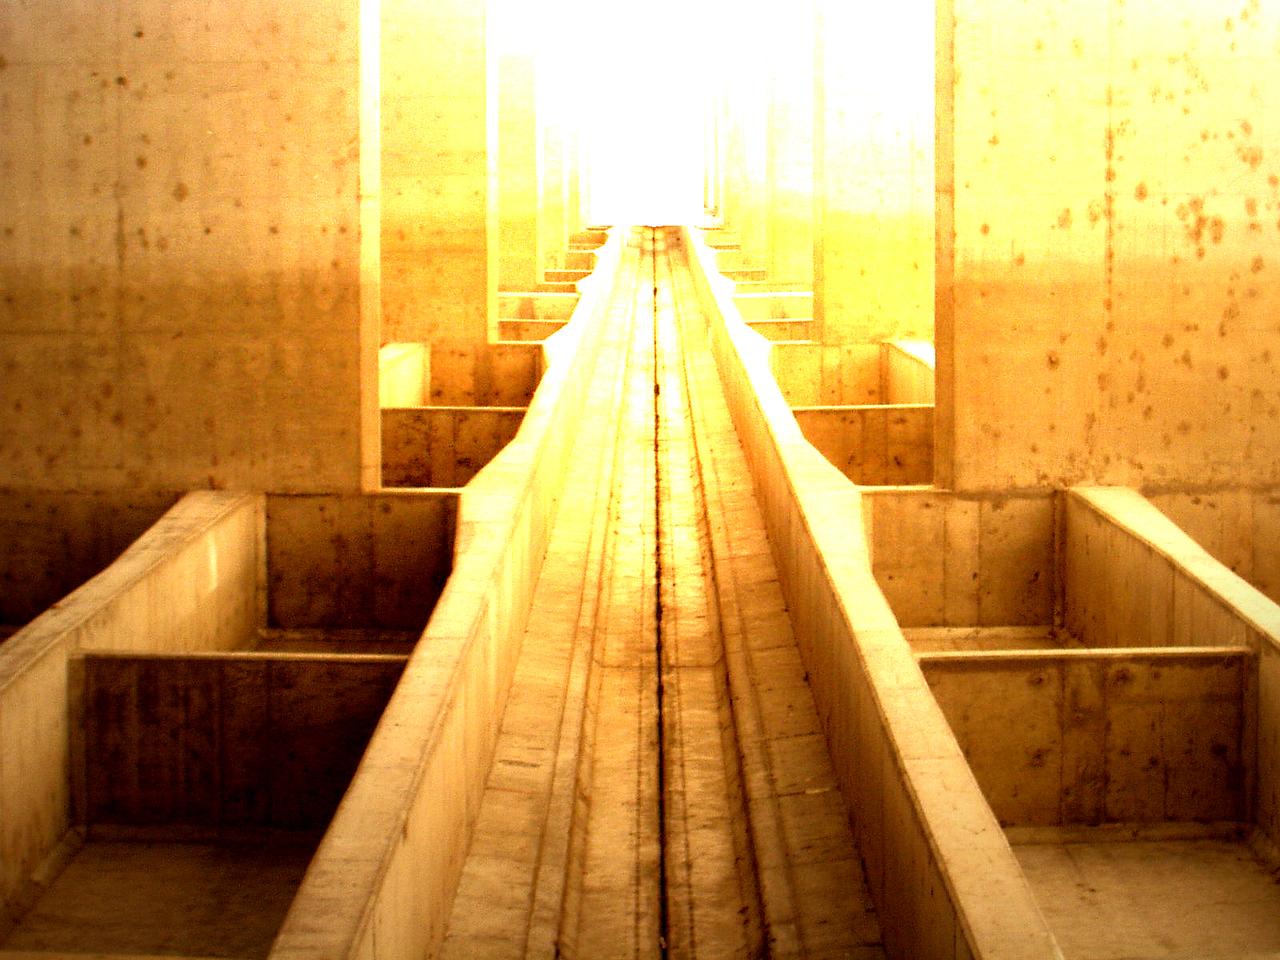 Looking toward eternity